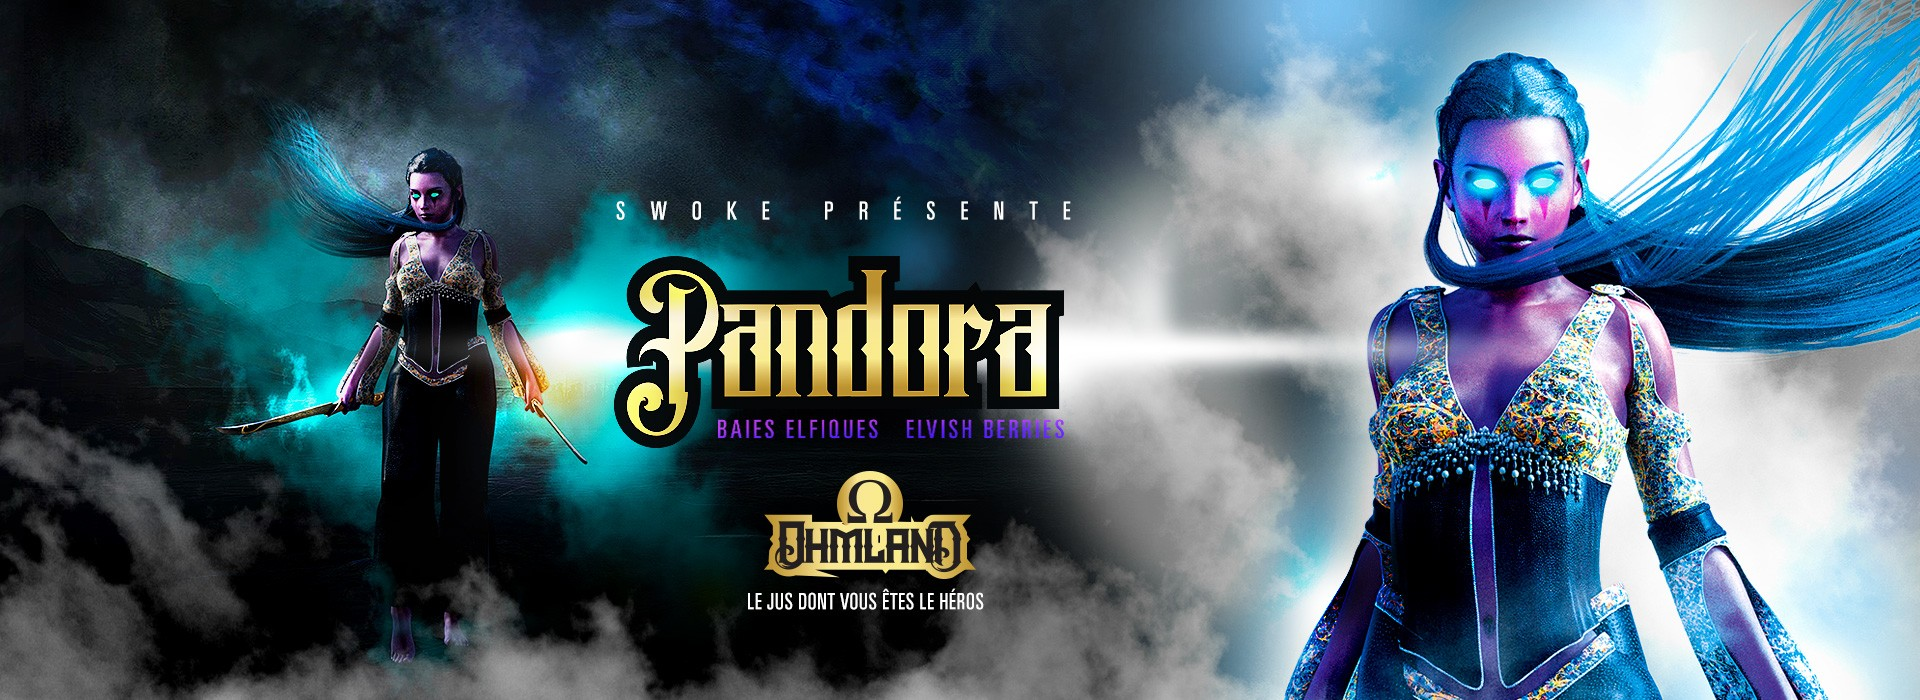 Pandora by Swoke